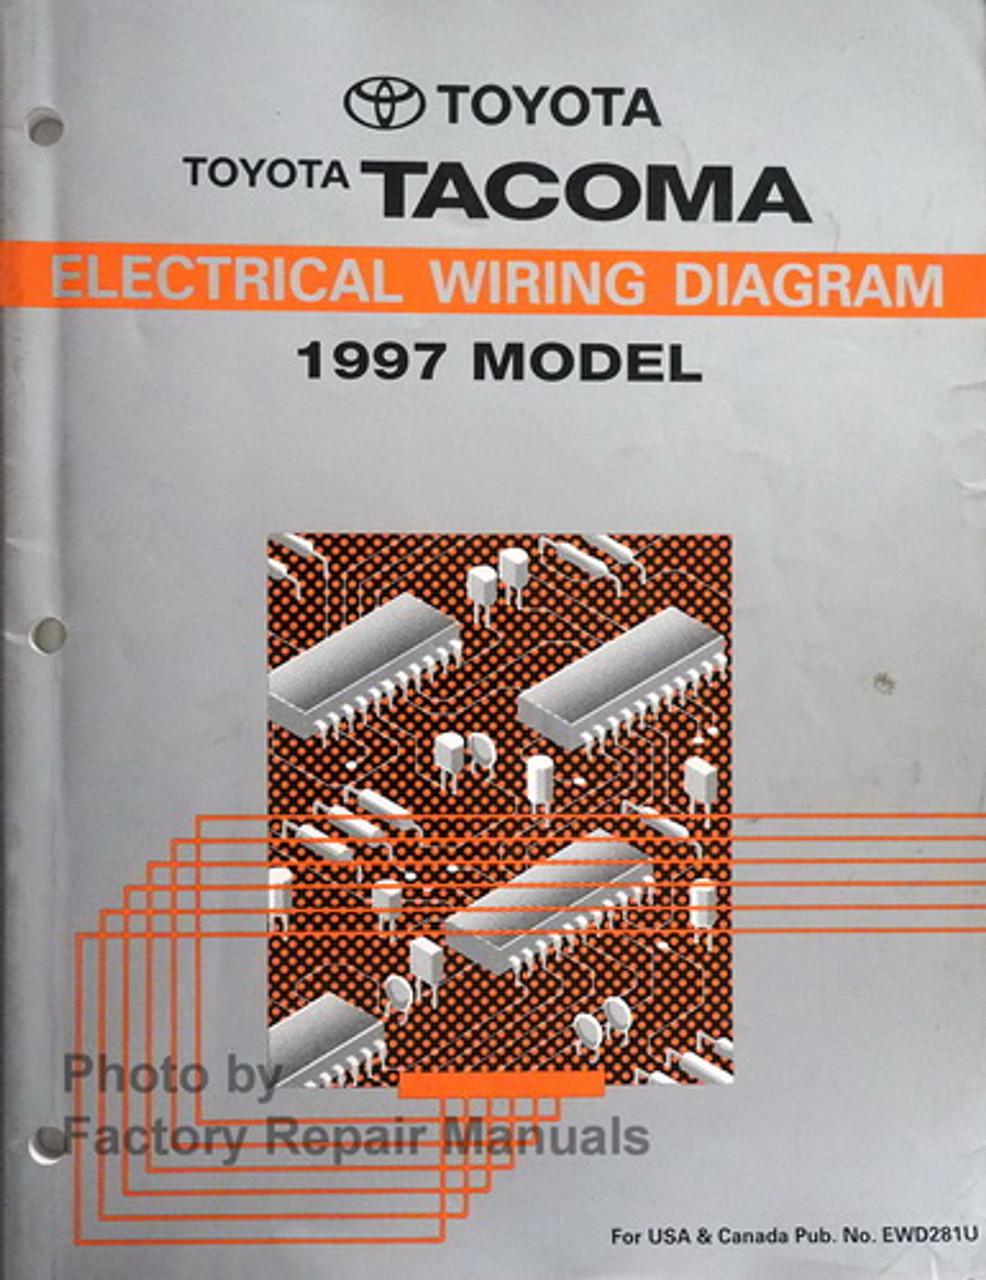 [XOTG_4463]  1997 Toyota Tacoma Electrical Wiring Diagrams Original Factory Manual -  Factory Repair Manuals | 1997 Toyota Tacoma Wiring Diagram |  | Factory Repair Manuals